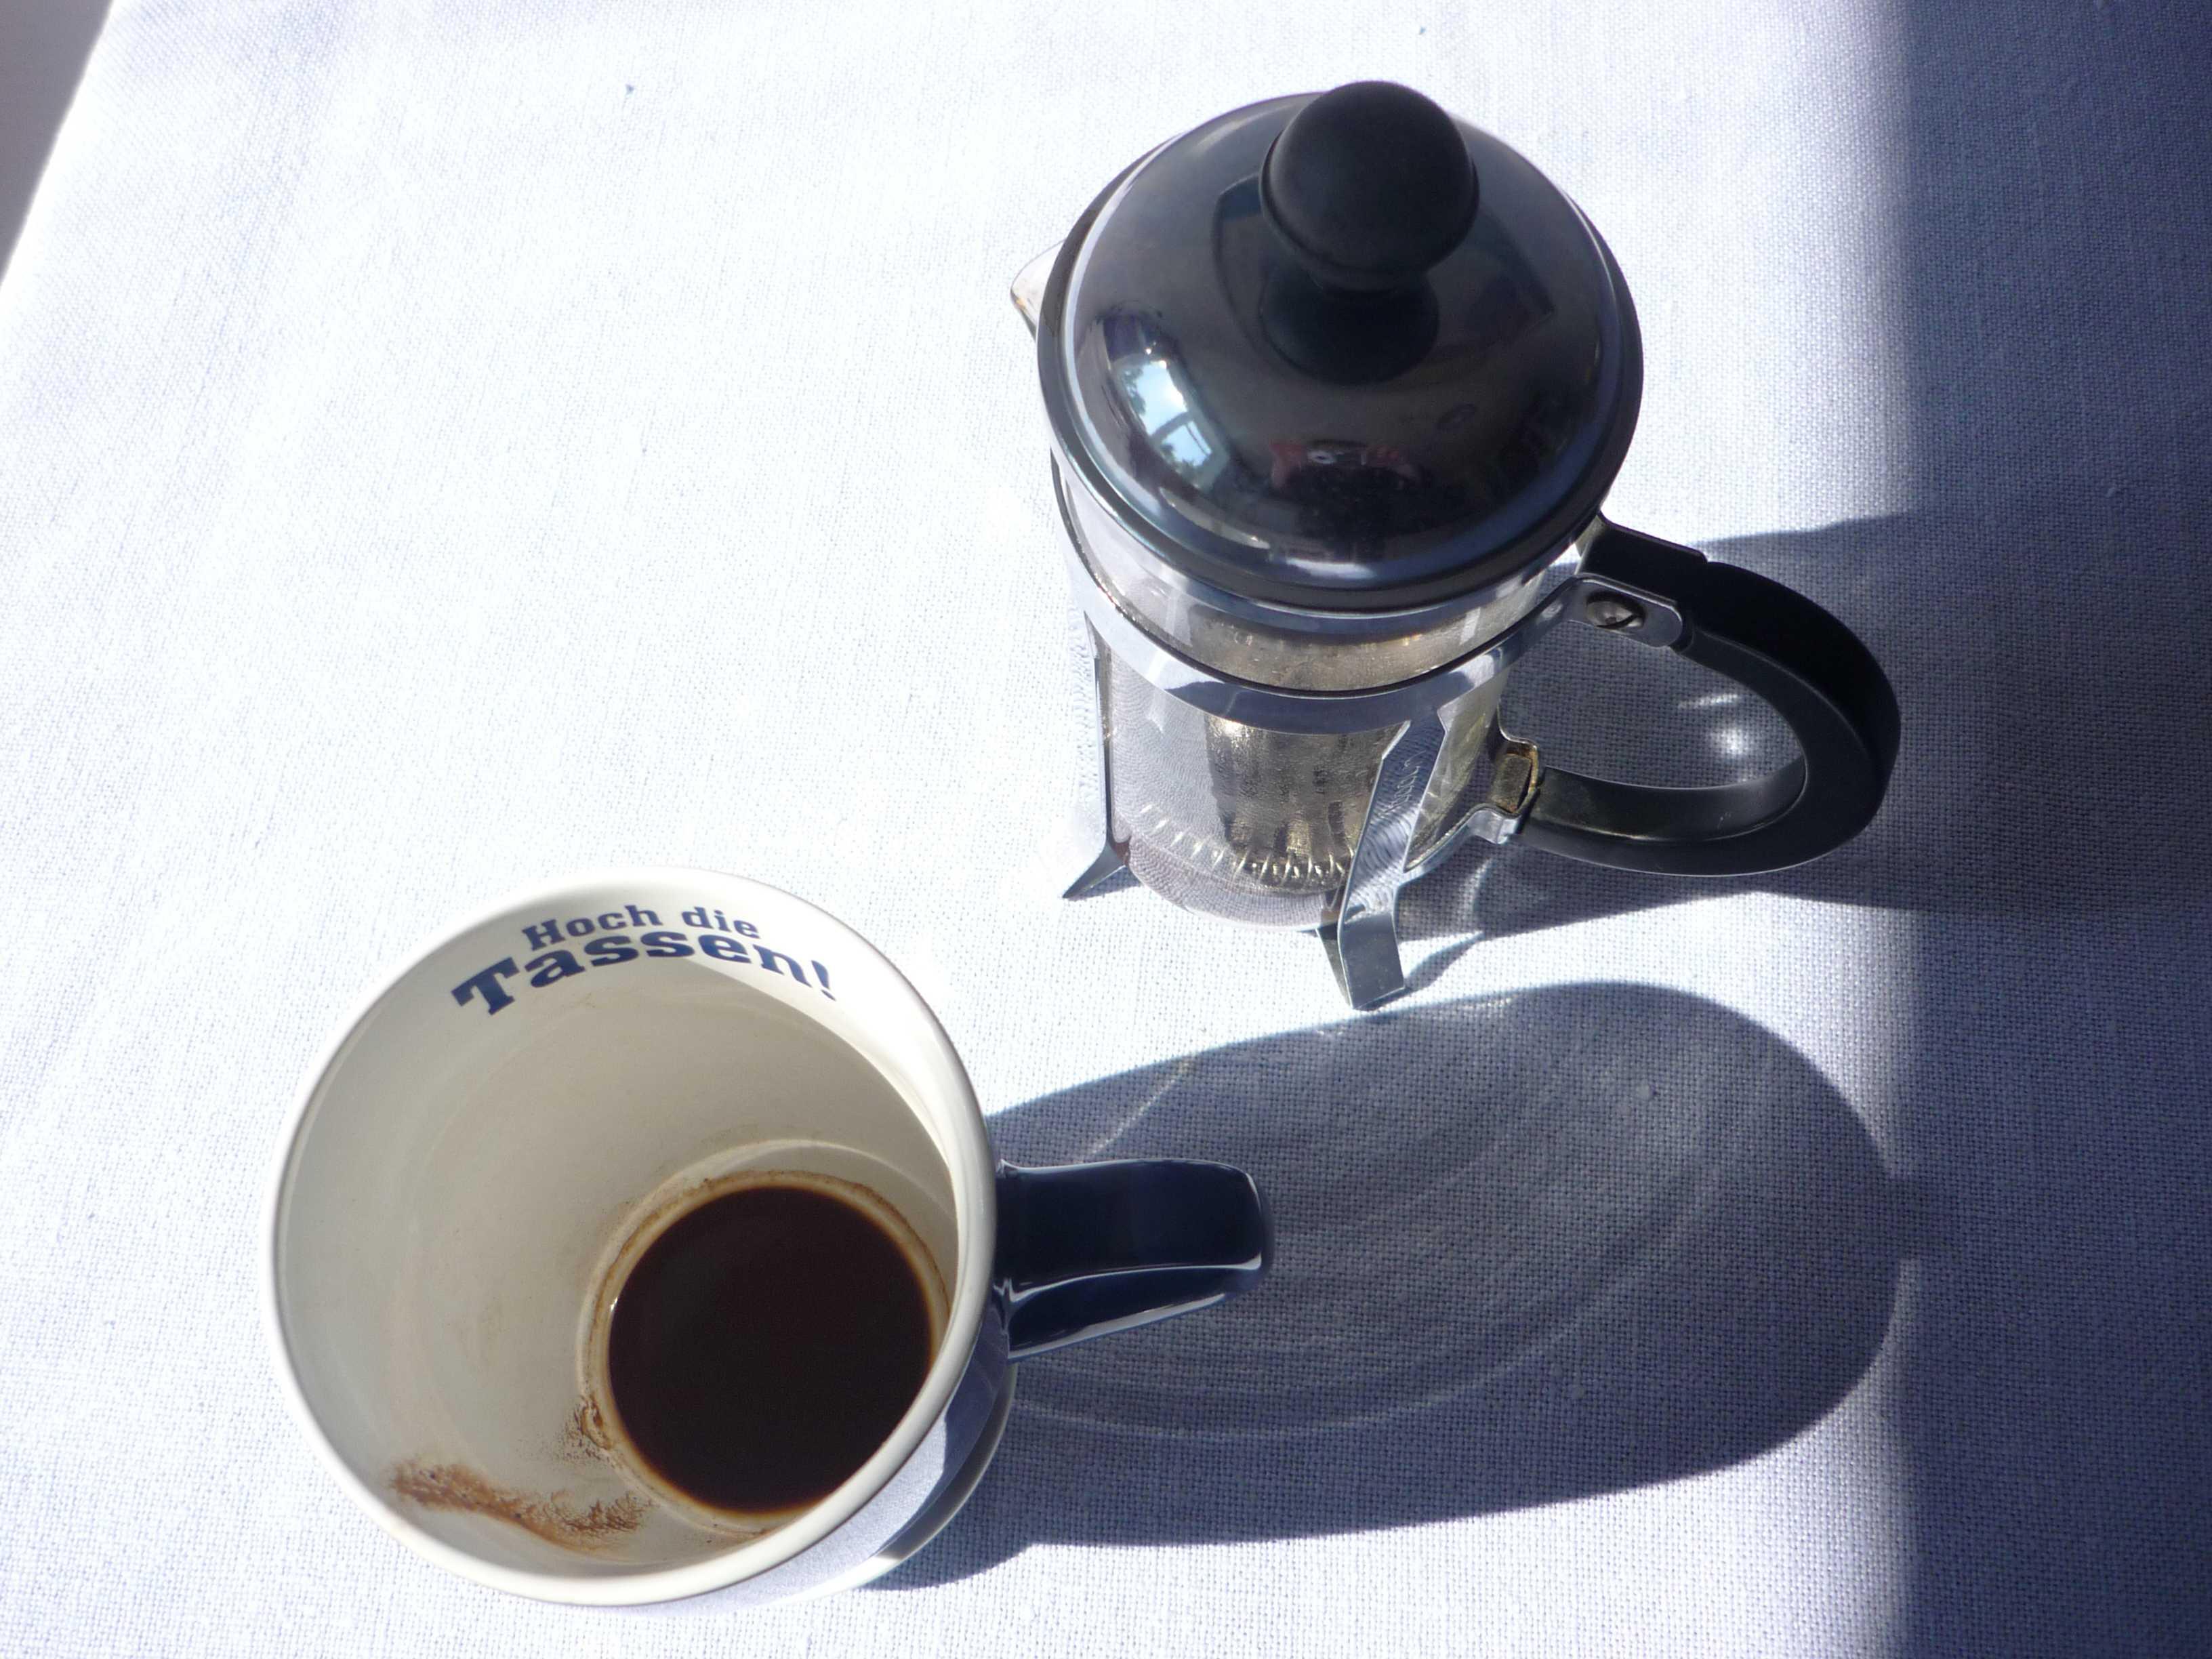 Morgen Kaffee.